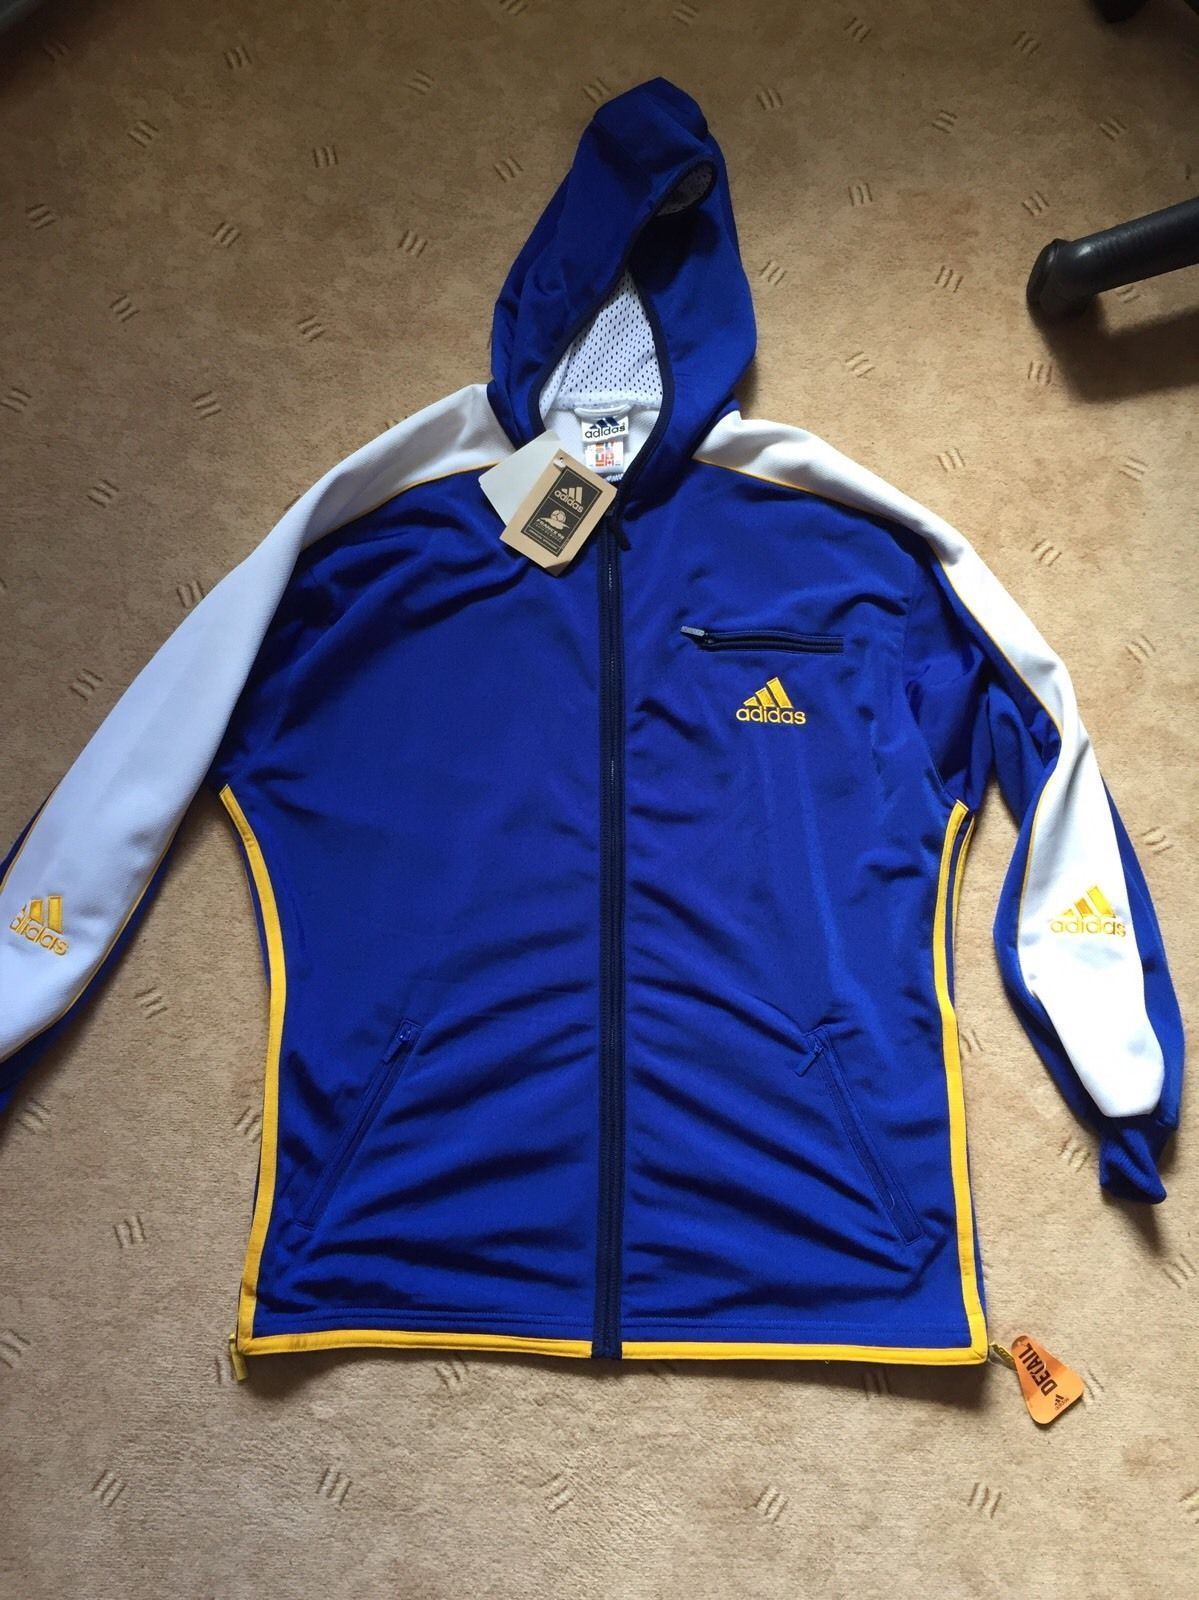 Adidas Jacke Kapuzen Pullover Luando Vintage Retro 90er 6 M